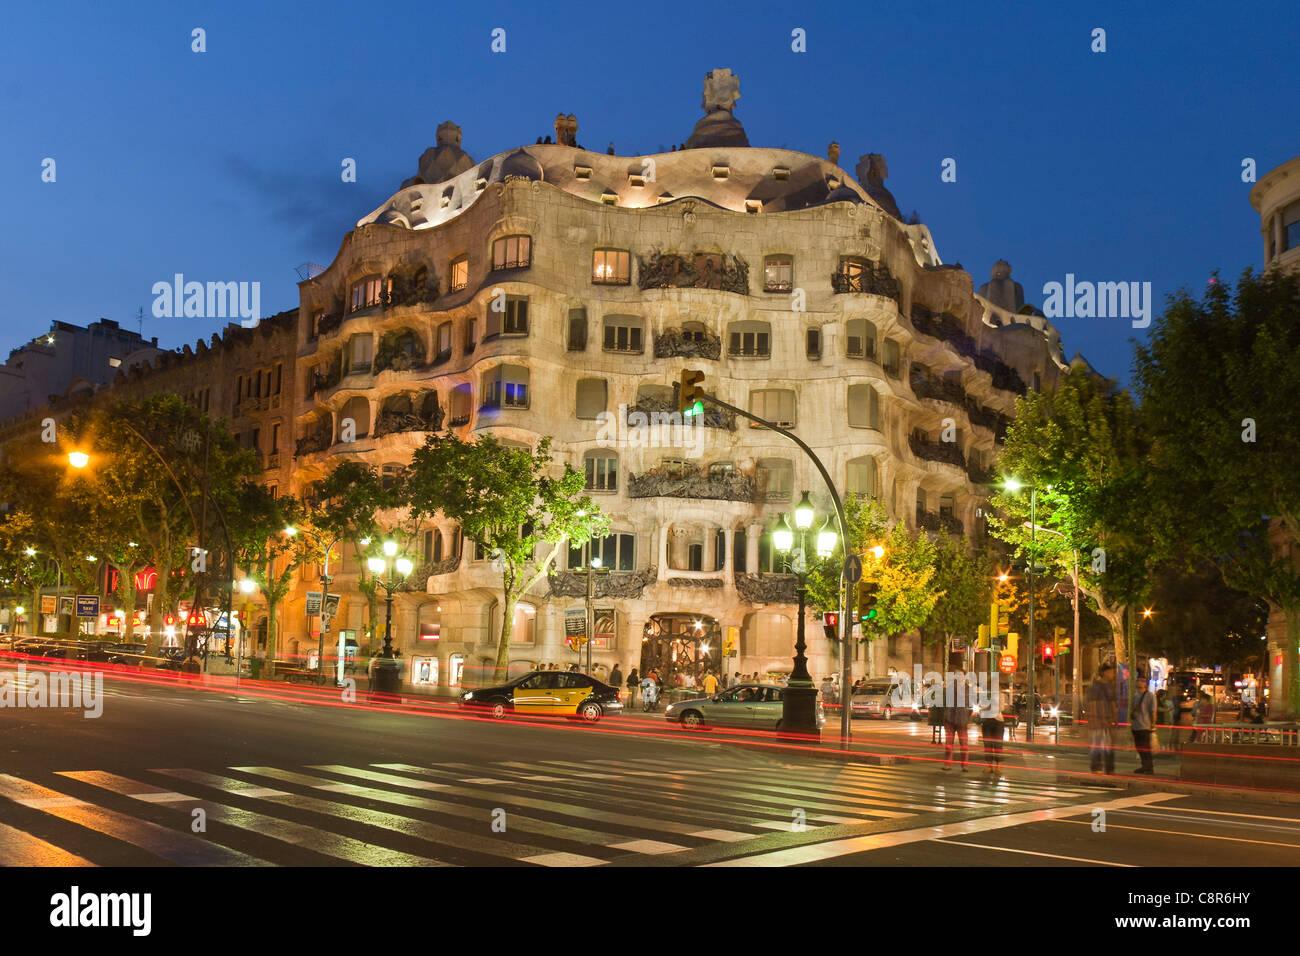 Casa Mila by Gaudi at twilight, laterne, Passeig de Gracia, - Stock Image